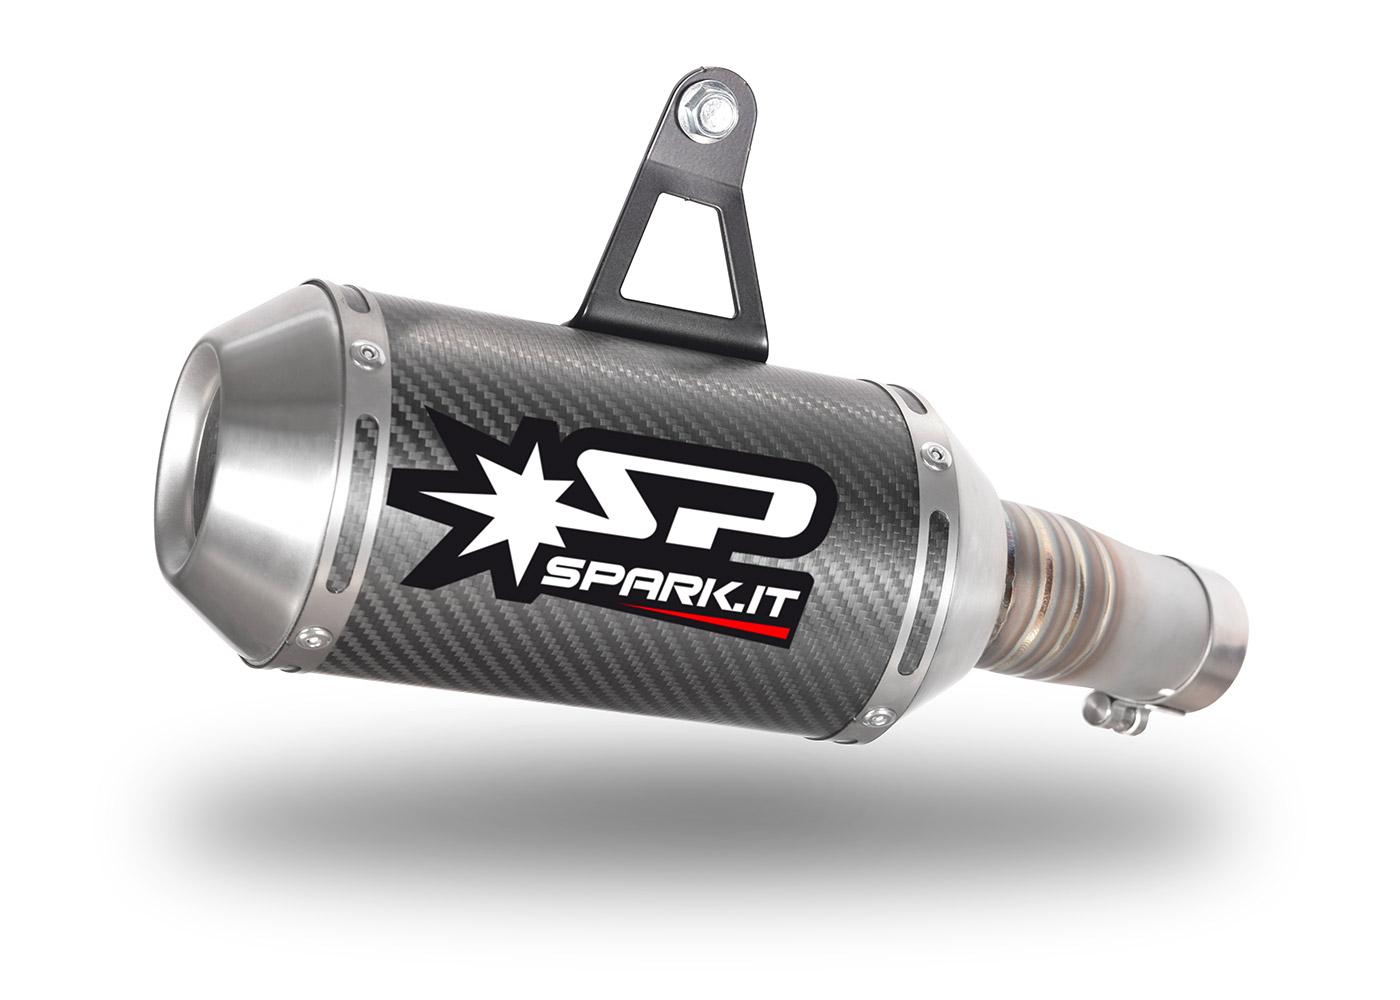 Silenziatore GKA8826 per kawasaki NINJA 400 (18-19) | SPARK Exhaust